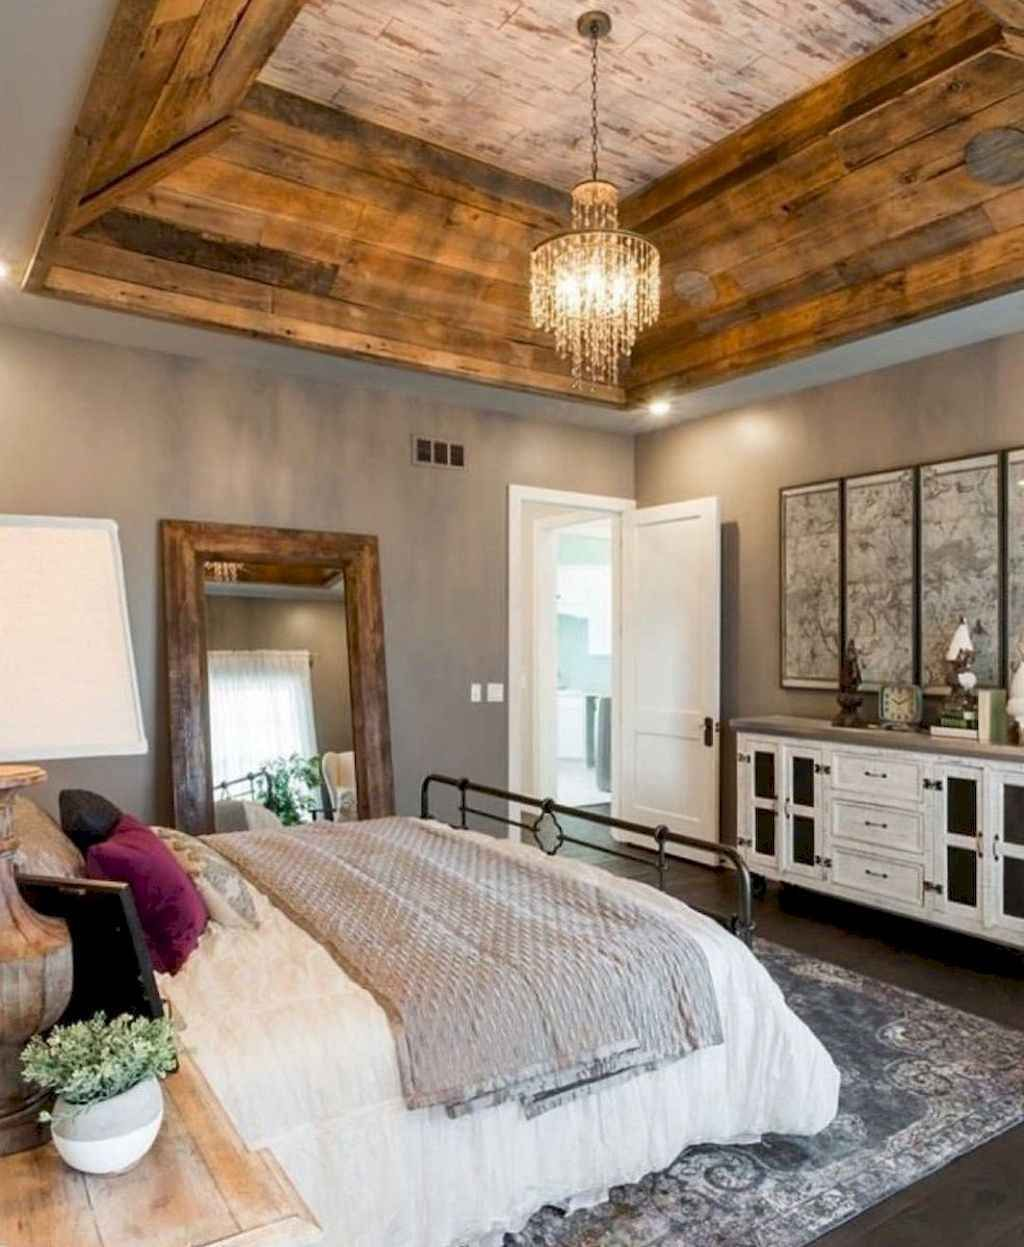 56 Moderne Bauernhaus In 2020 Rustic Master Bedroom Remodel